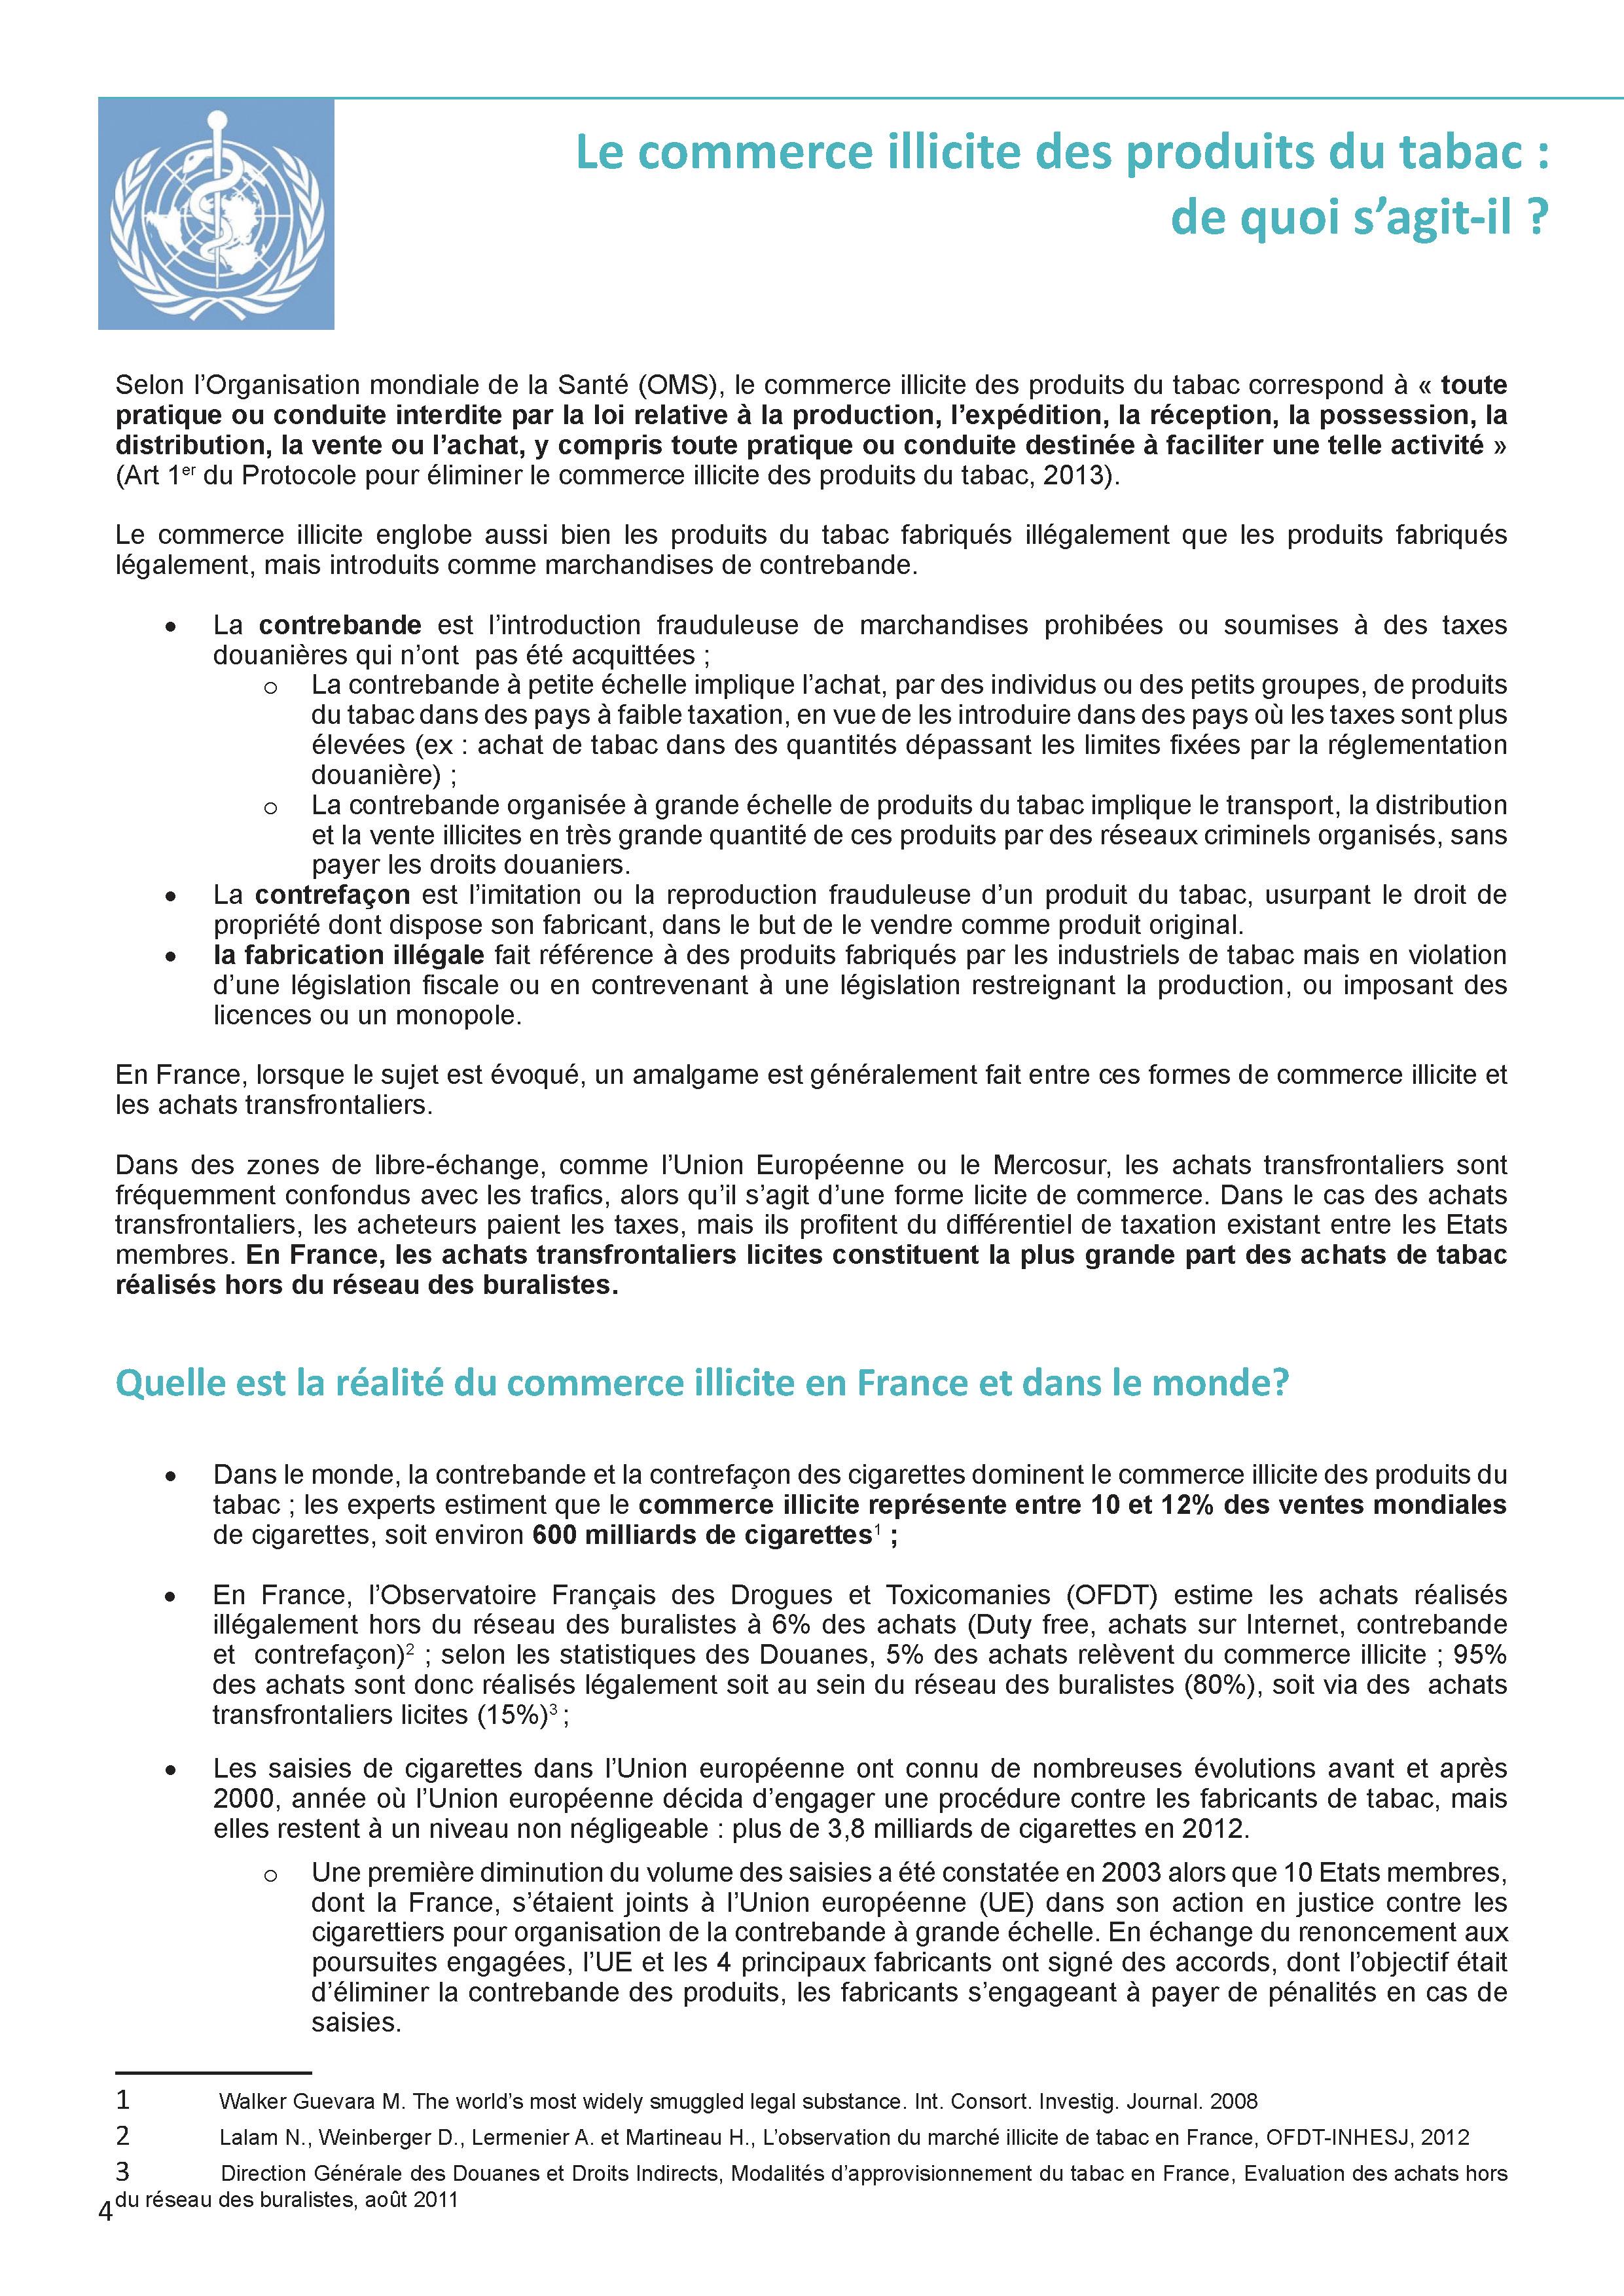 Alliance-DP_commerce-illicite-26mai2015_Page_04.jpg